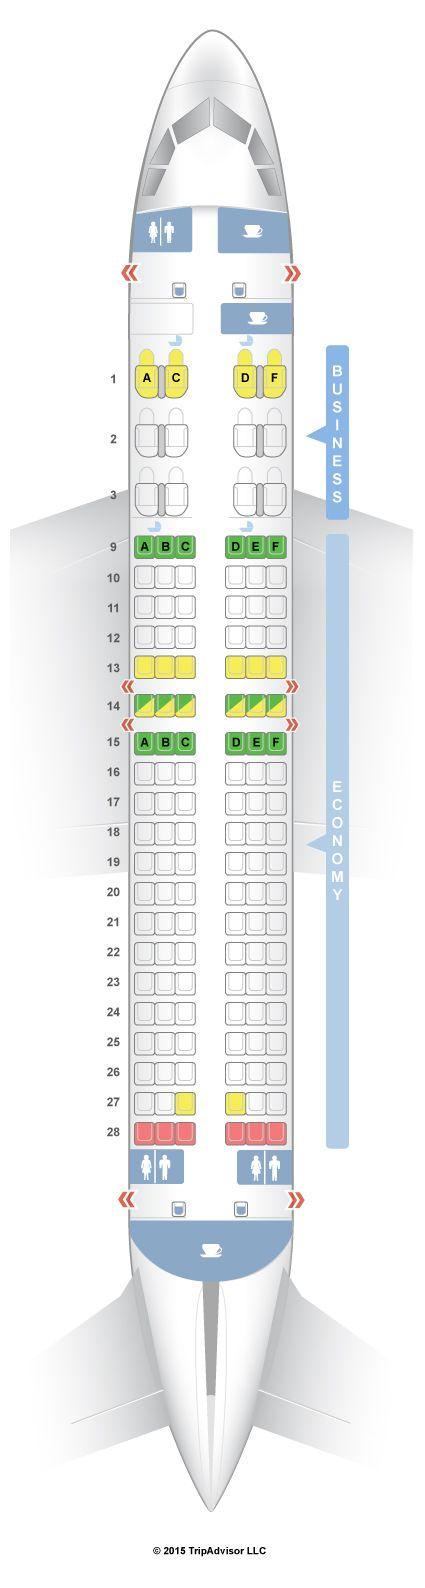 SeatGuru Seat Map Qatar Airways Airbus A320 (320) V2